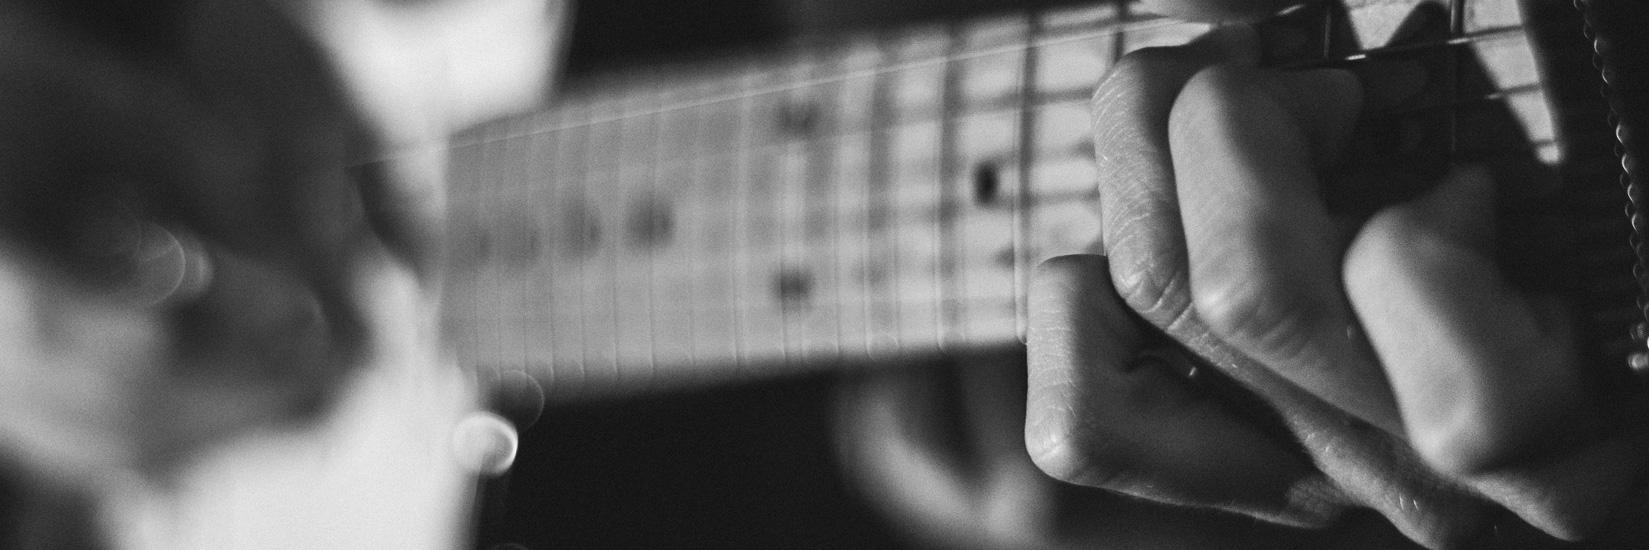 guitarslider3